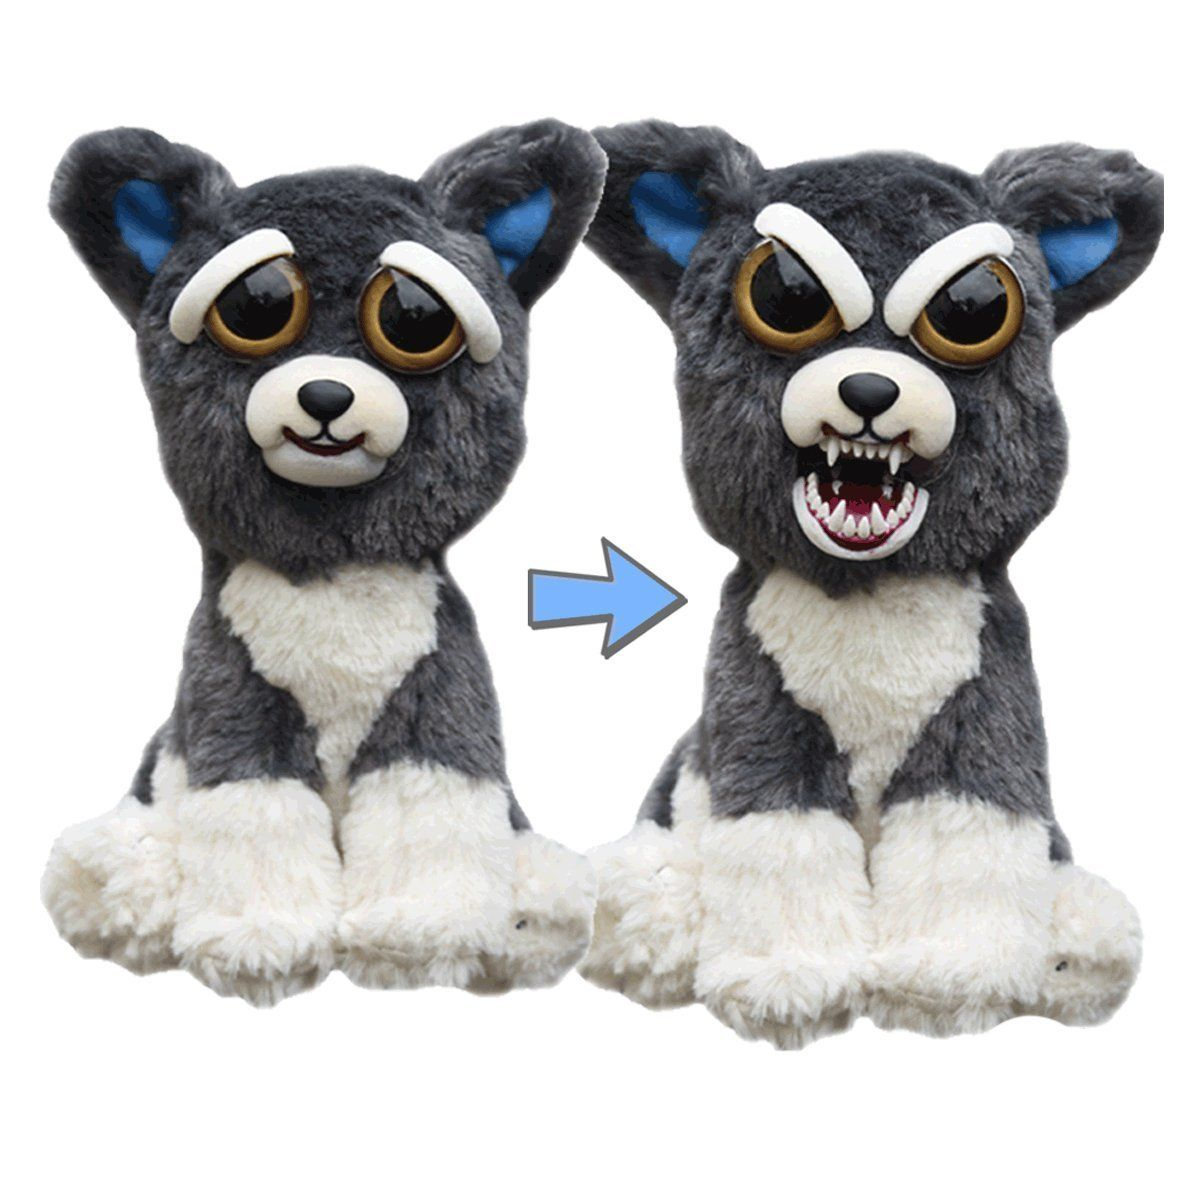 Boughtagain Awesome Goods You Bought It Again Plush Dog Bear Stuffed Animal Teddy Bear Stuffed Animal